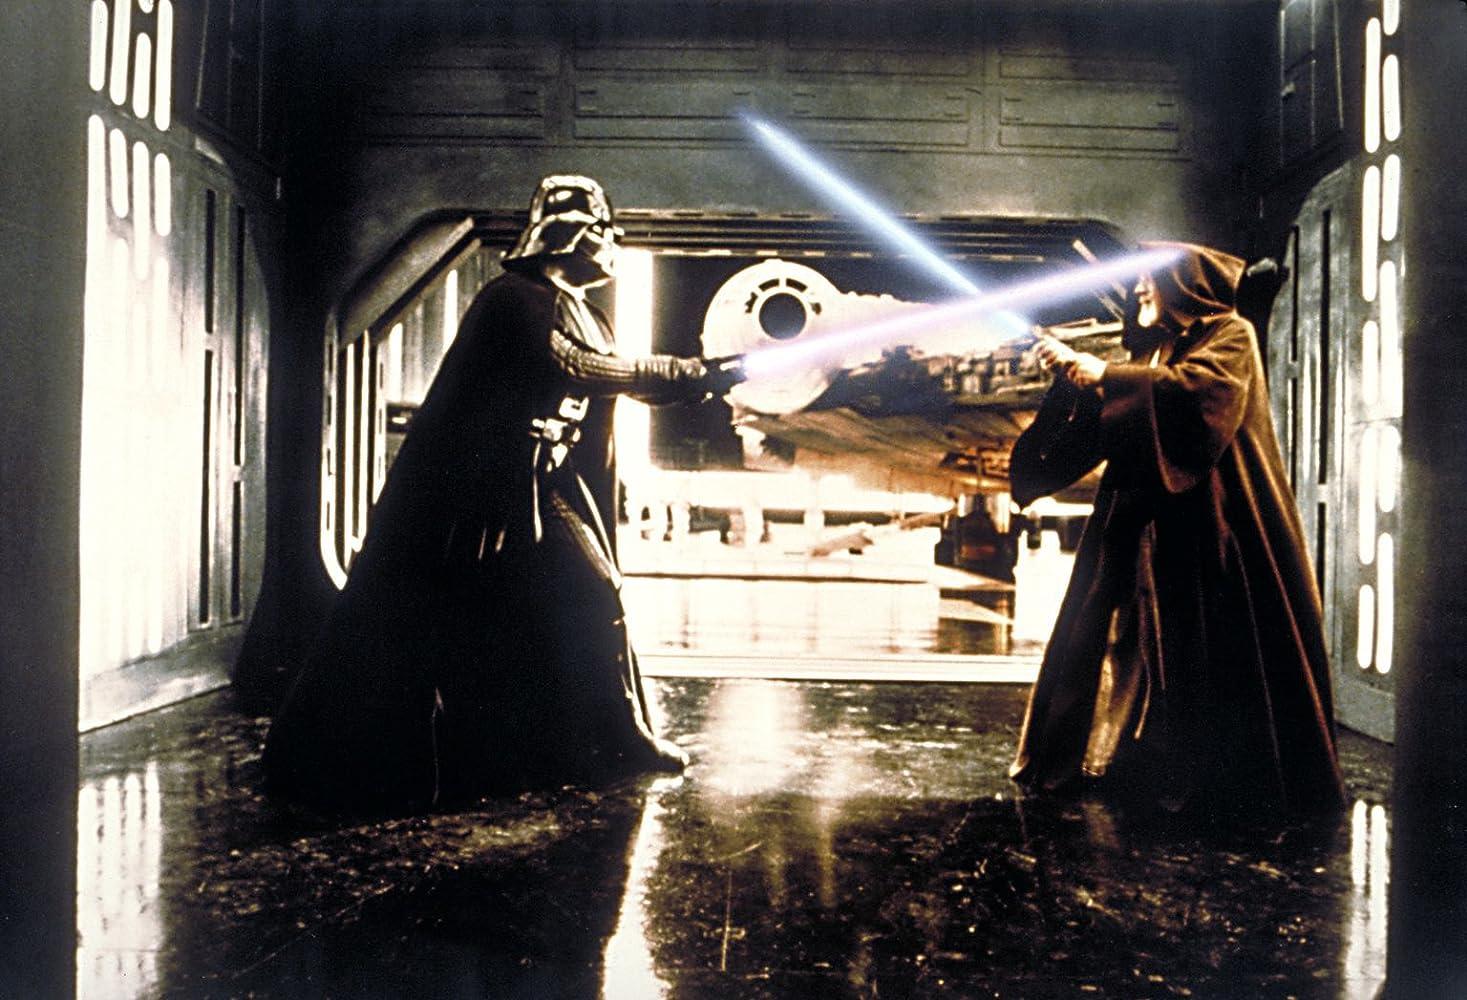 Imdb Staffs Favorite Star Wars Quotes